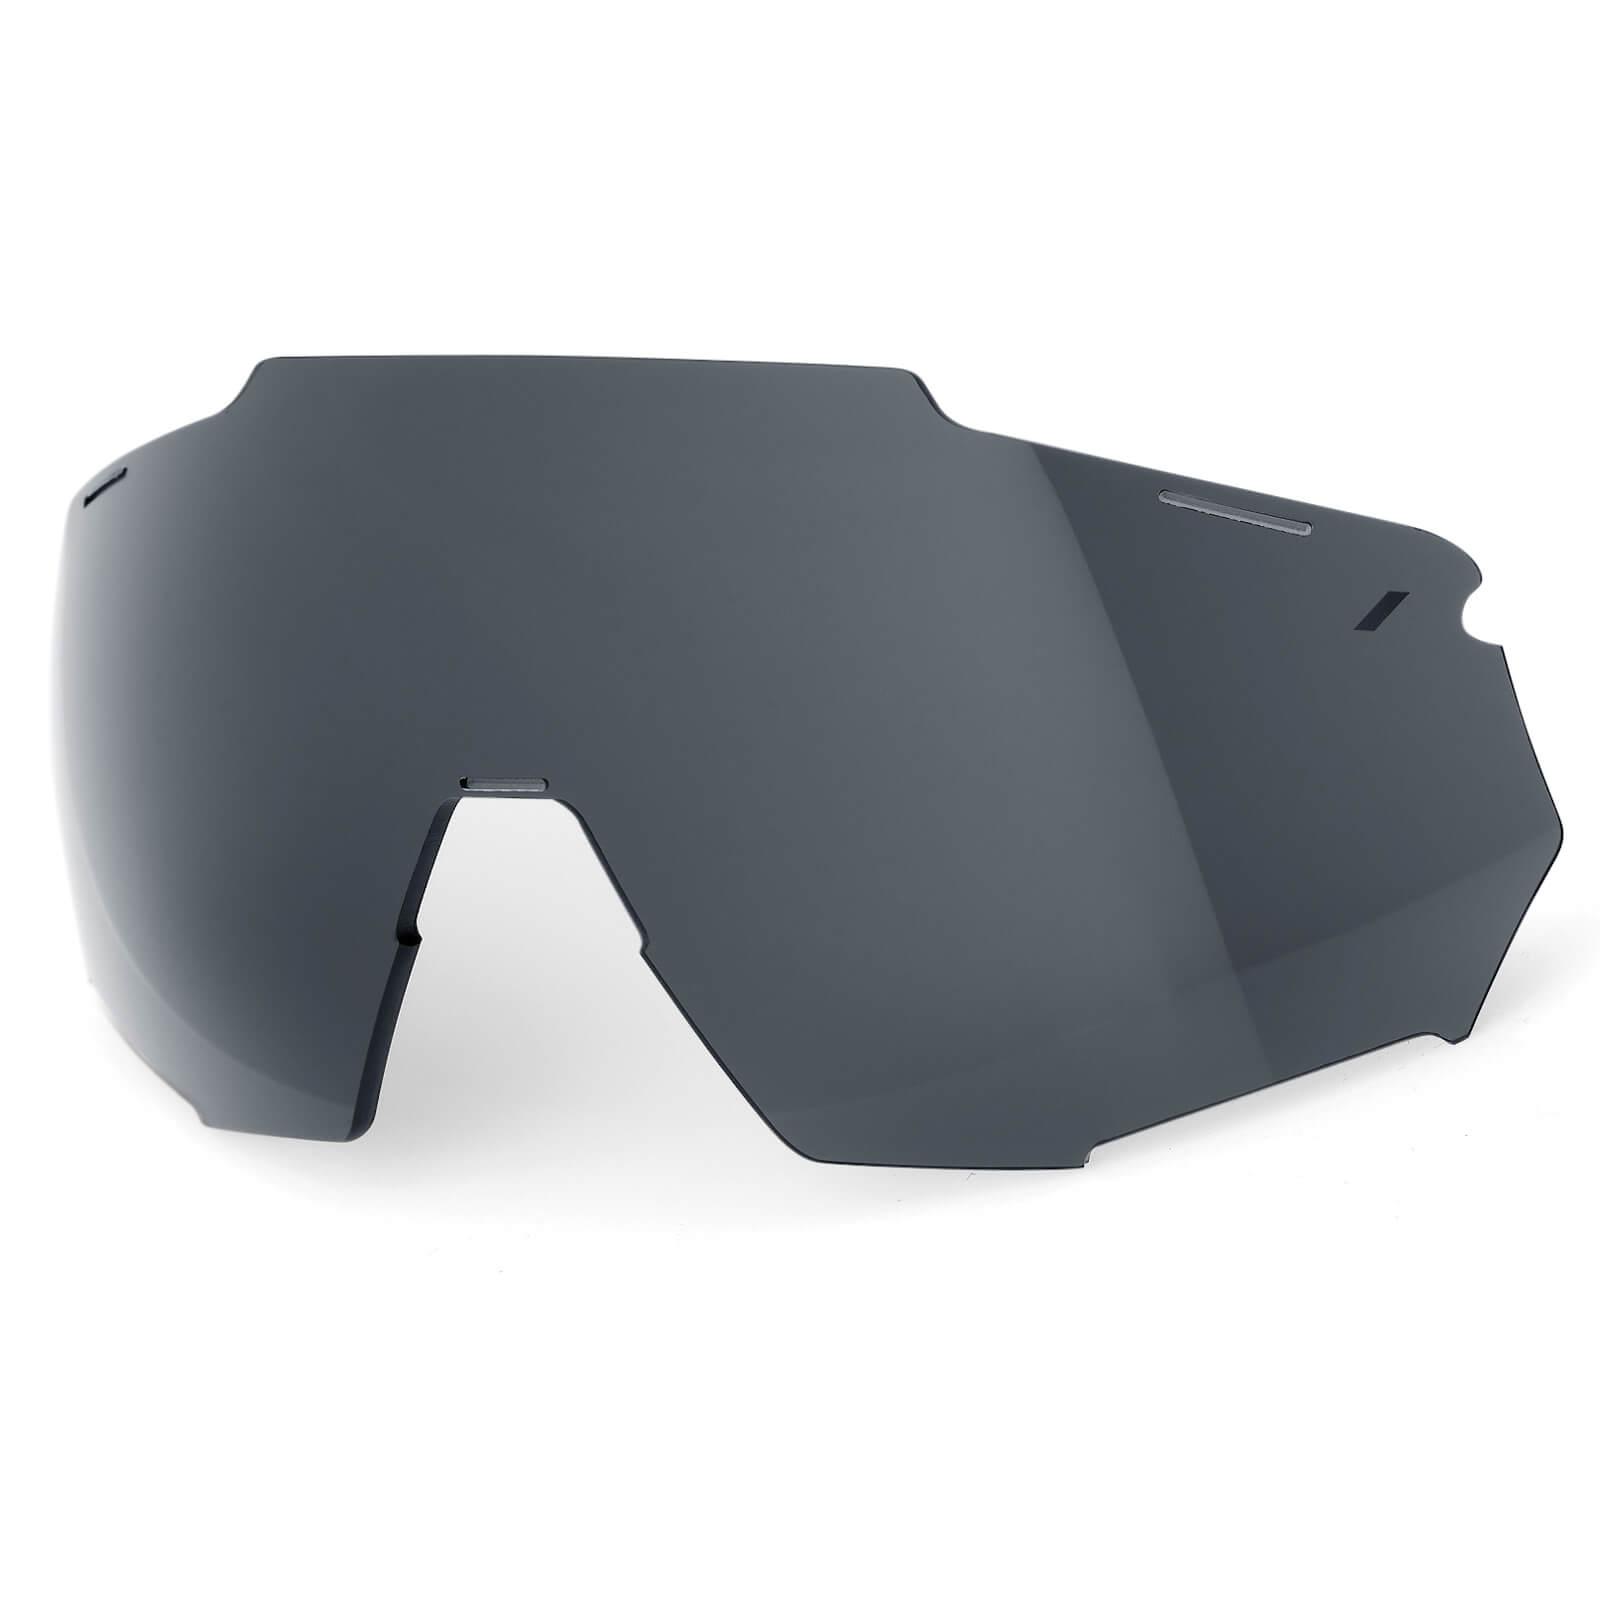 100% Racetrap Replacement Lens - Smoke